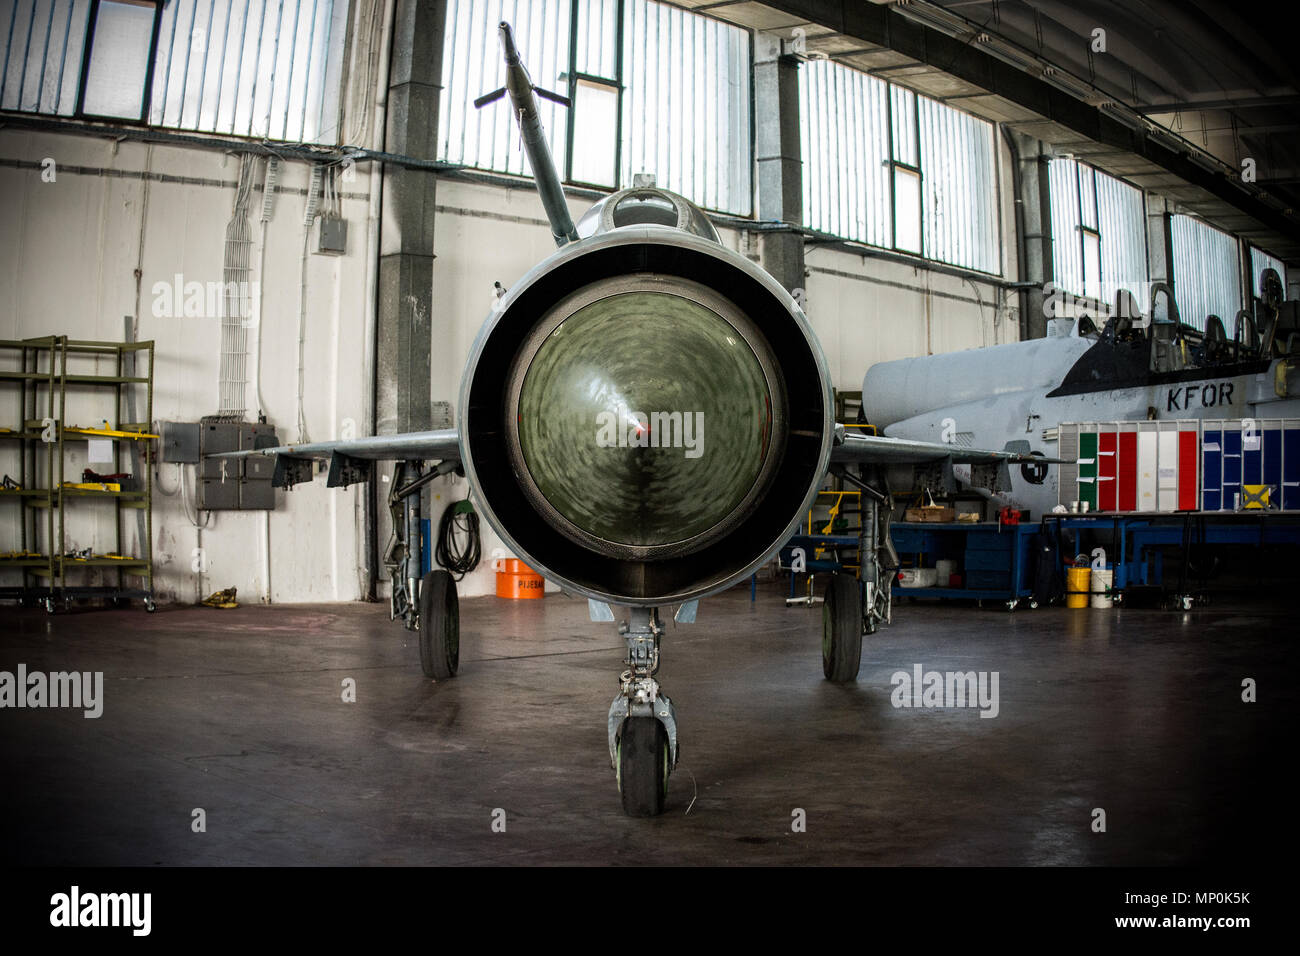 air show MiG-21 - Stock Image